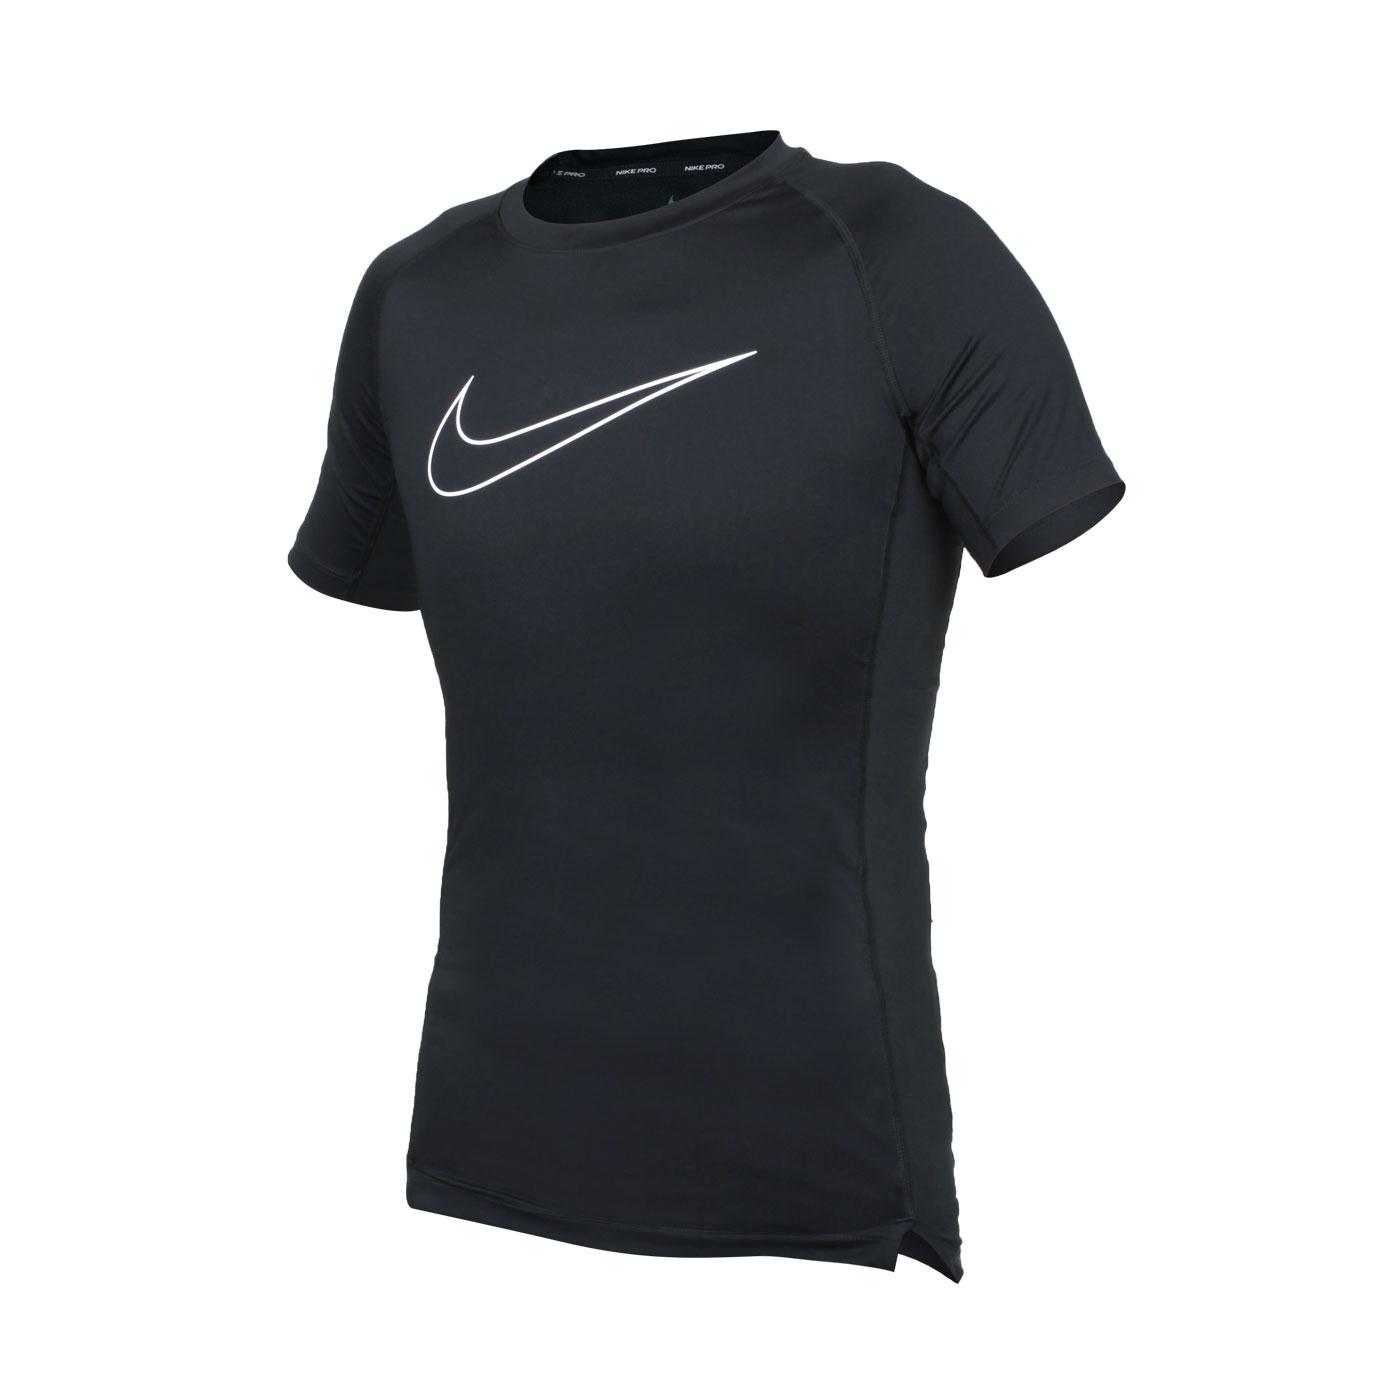 NIKE 男款緊身短袖T恤 DD1993-010 - 黑白